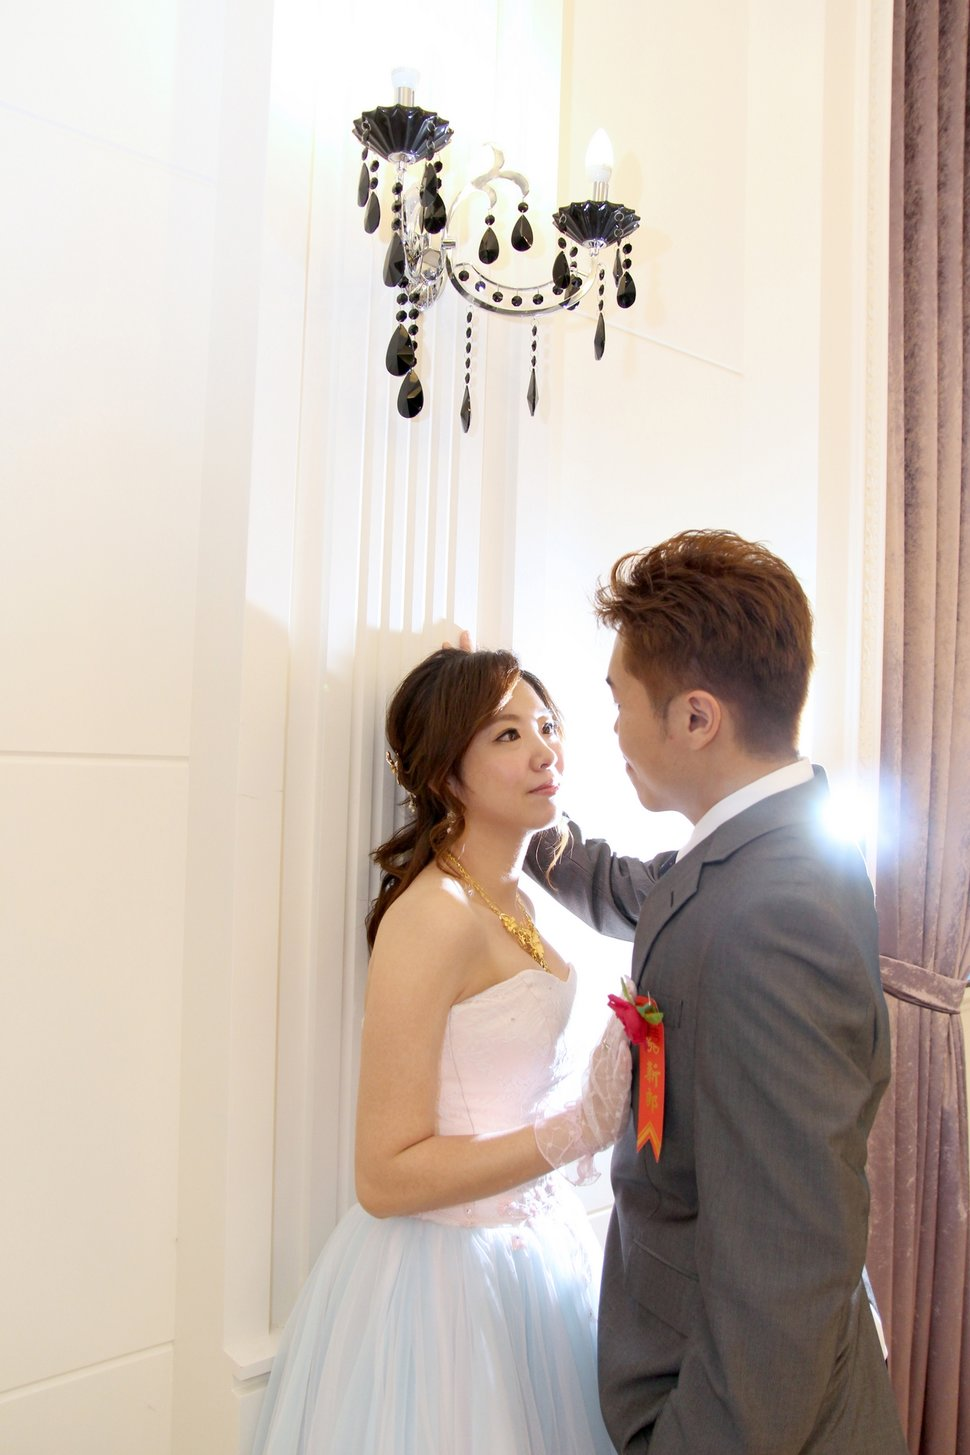 IMG_0031 - 瑞比特婚禮紀錄攝影 - 結婚吧